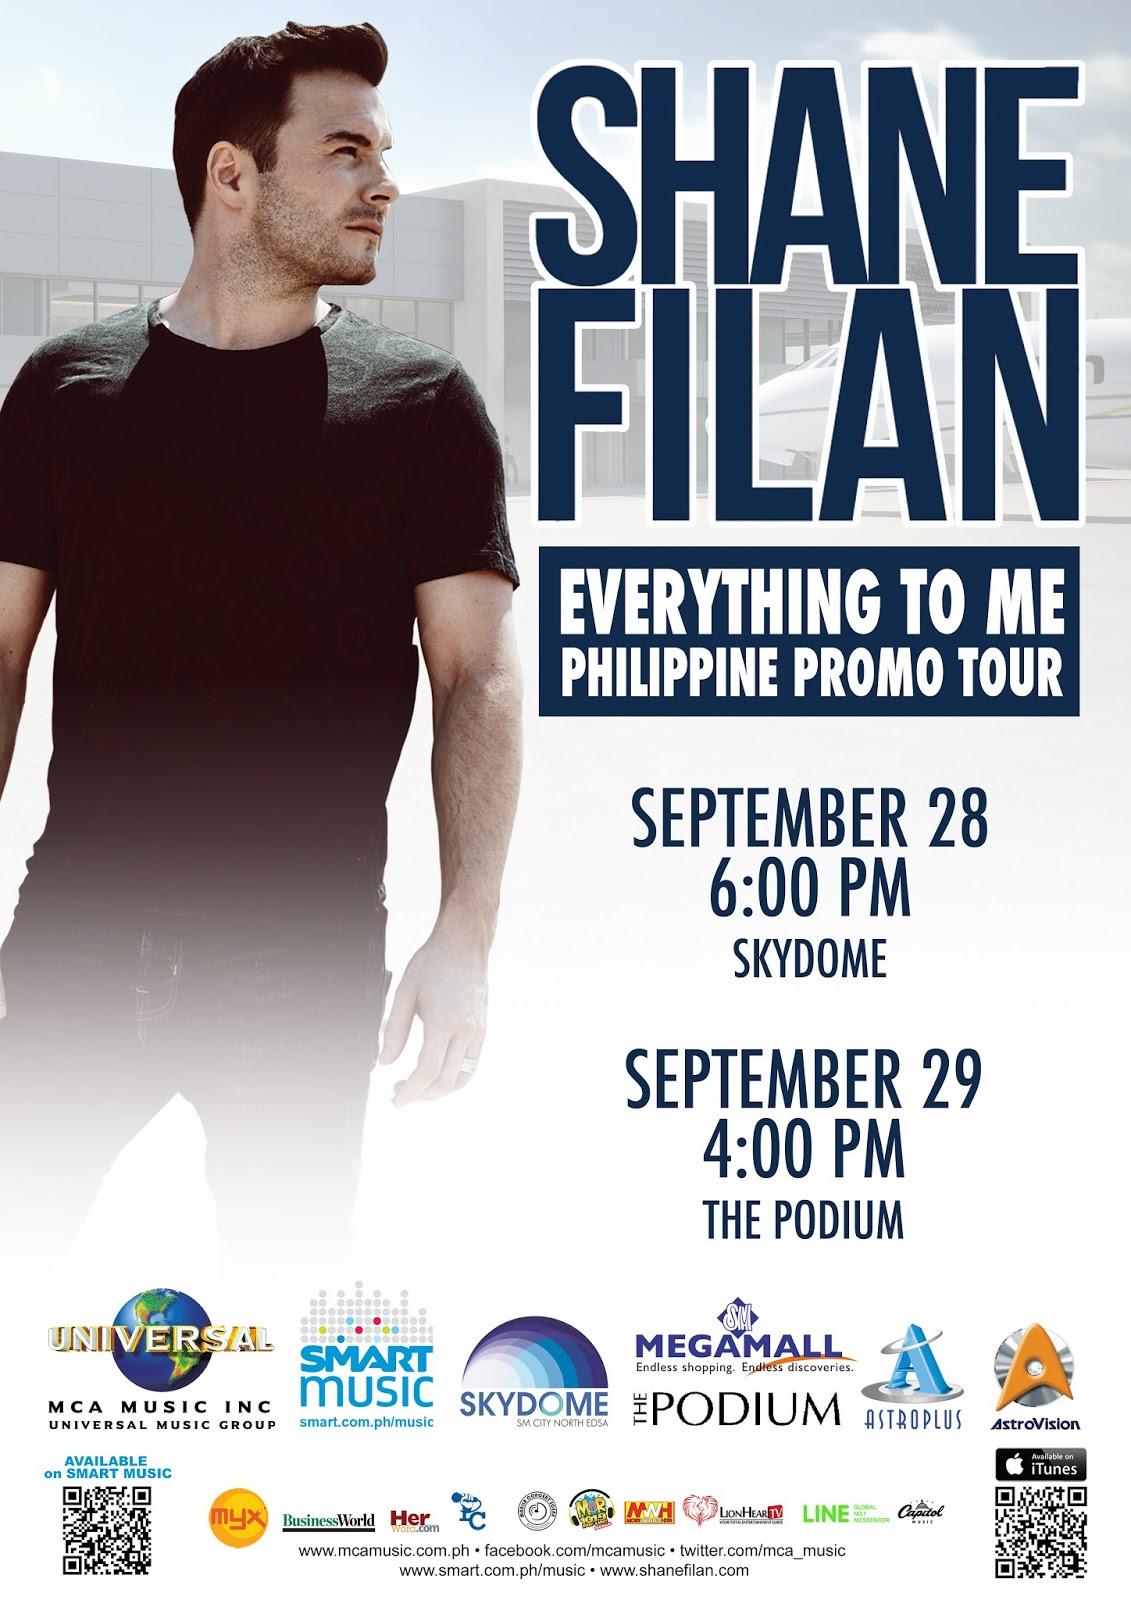 https://4.bp.blogspot.com/--C0c-NM9jSA/UjqW4n7nMgI/AAAAAAAAJAg/h8GzW1kINIg/s1600/Shane-Filan-Manila-Promo-Tour-1.jpg